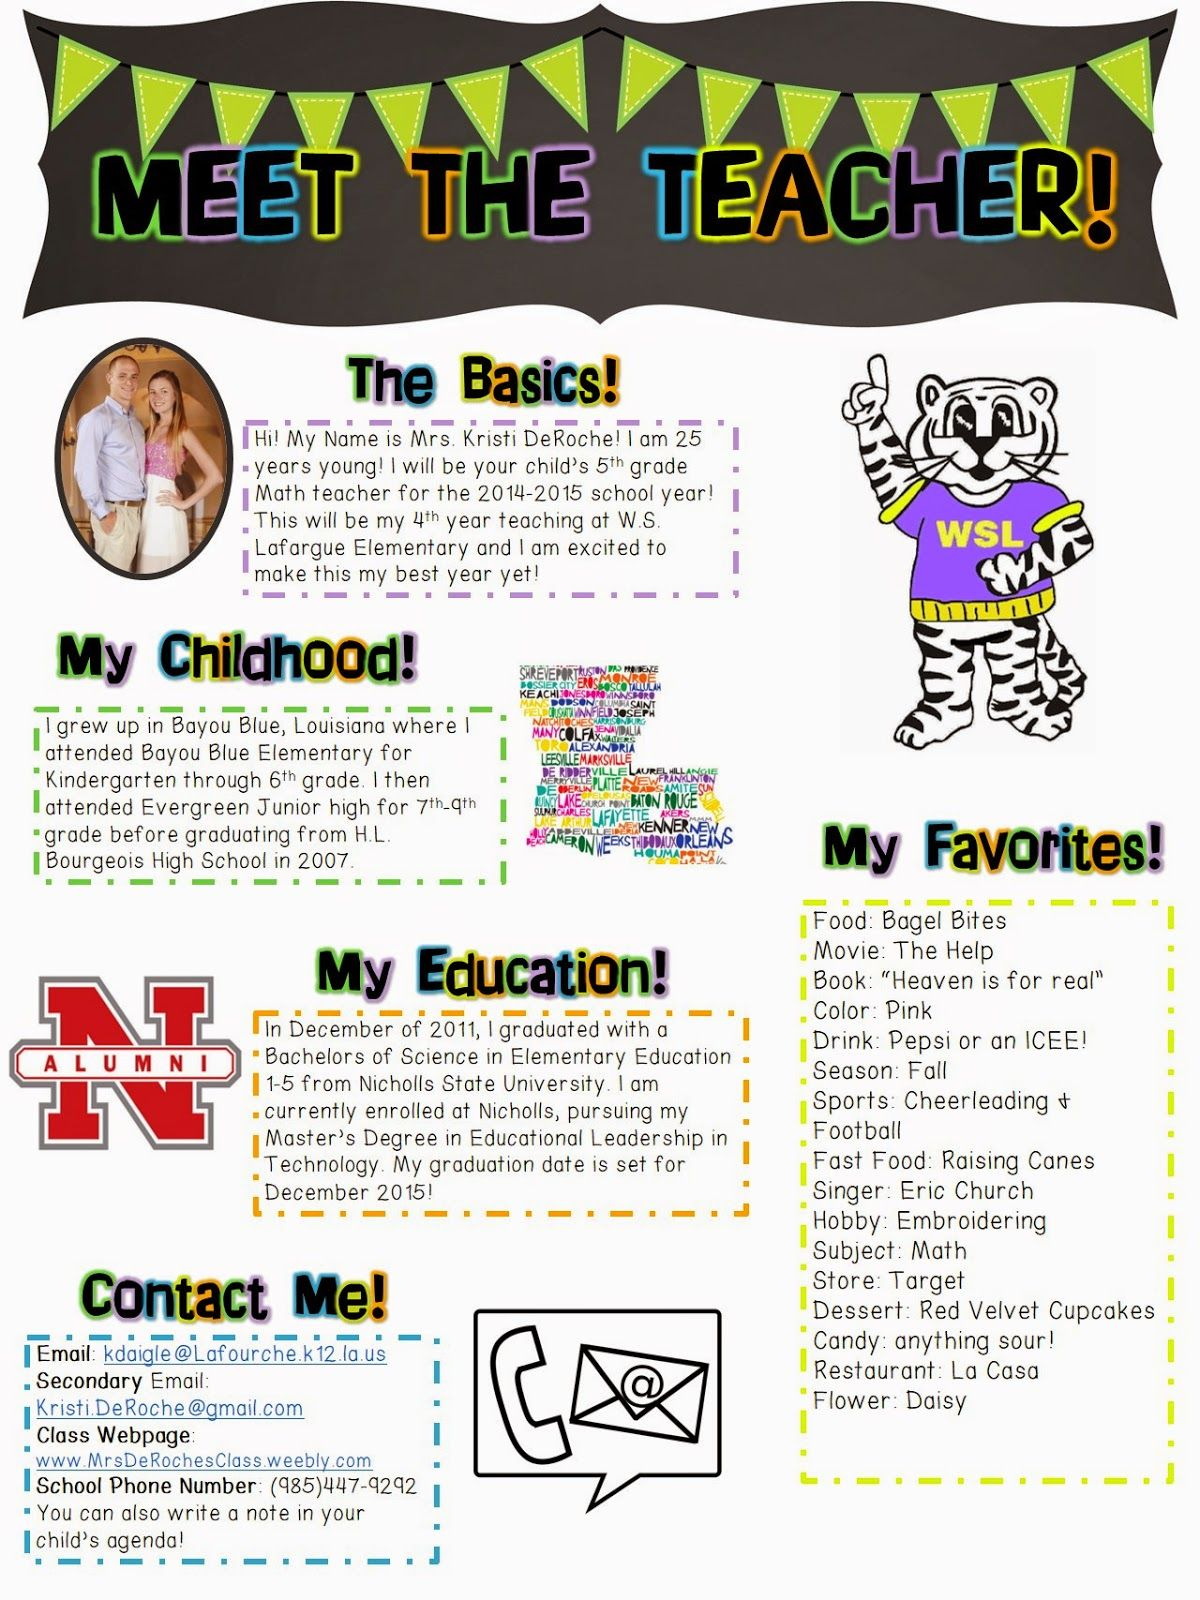 Keep Calm And Teach On Classroom Sneak Peek  Sort Of